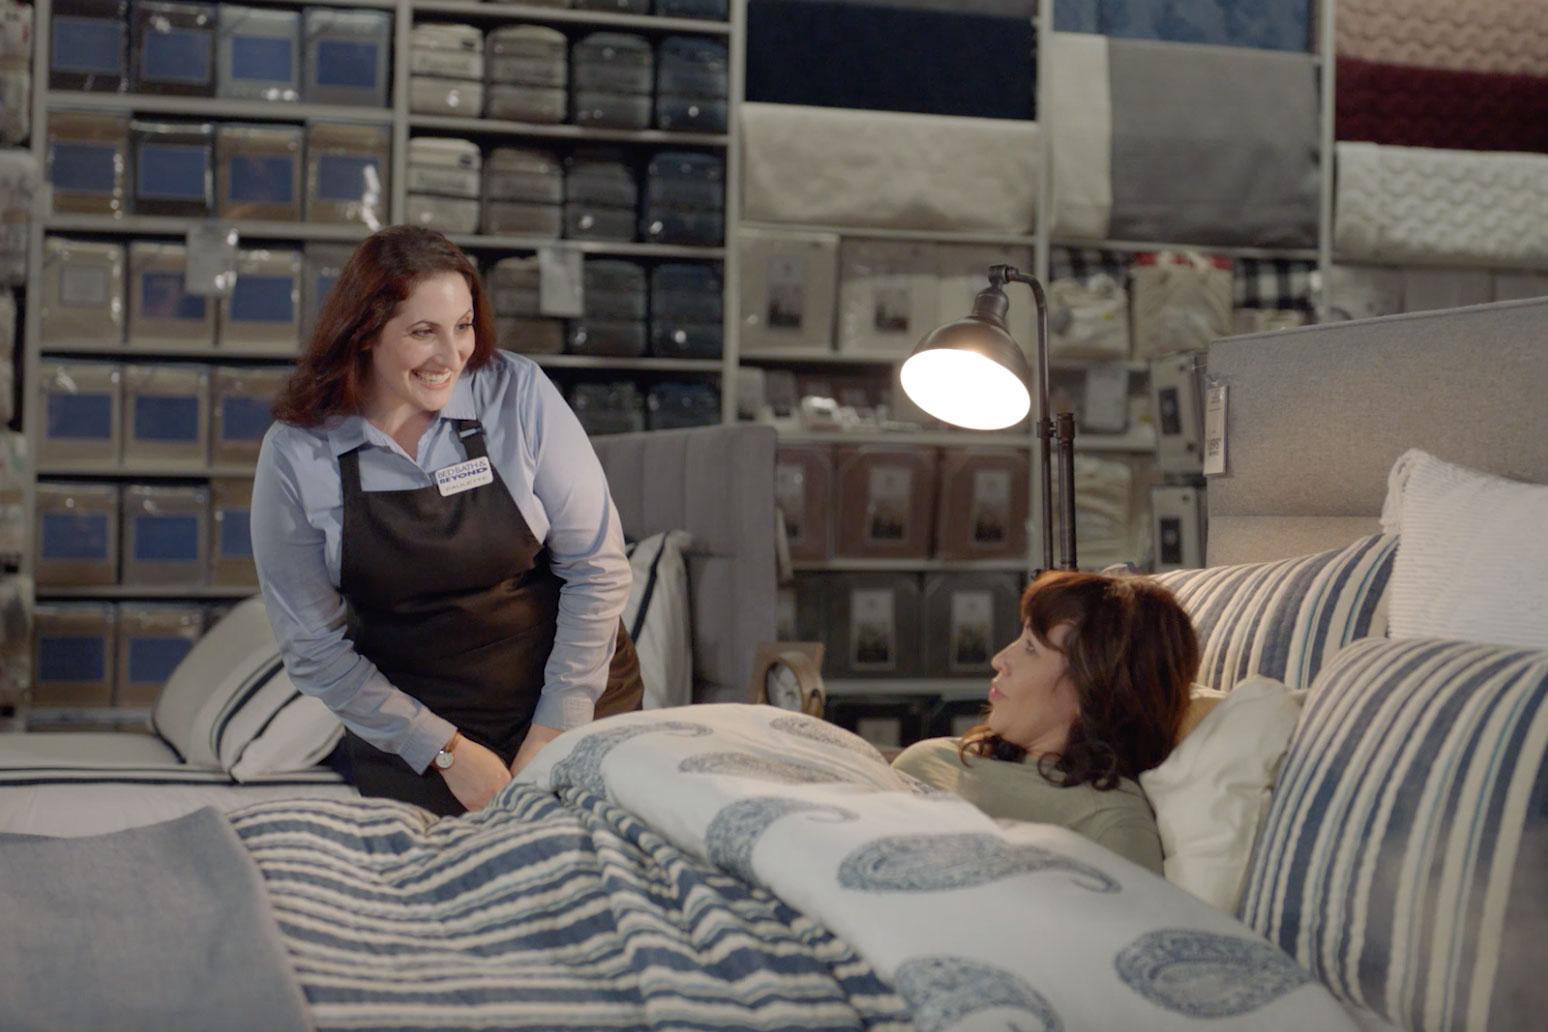 Sans CMO, Bed Bath & Beyond pushes new campaign